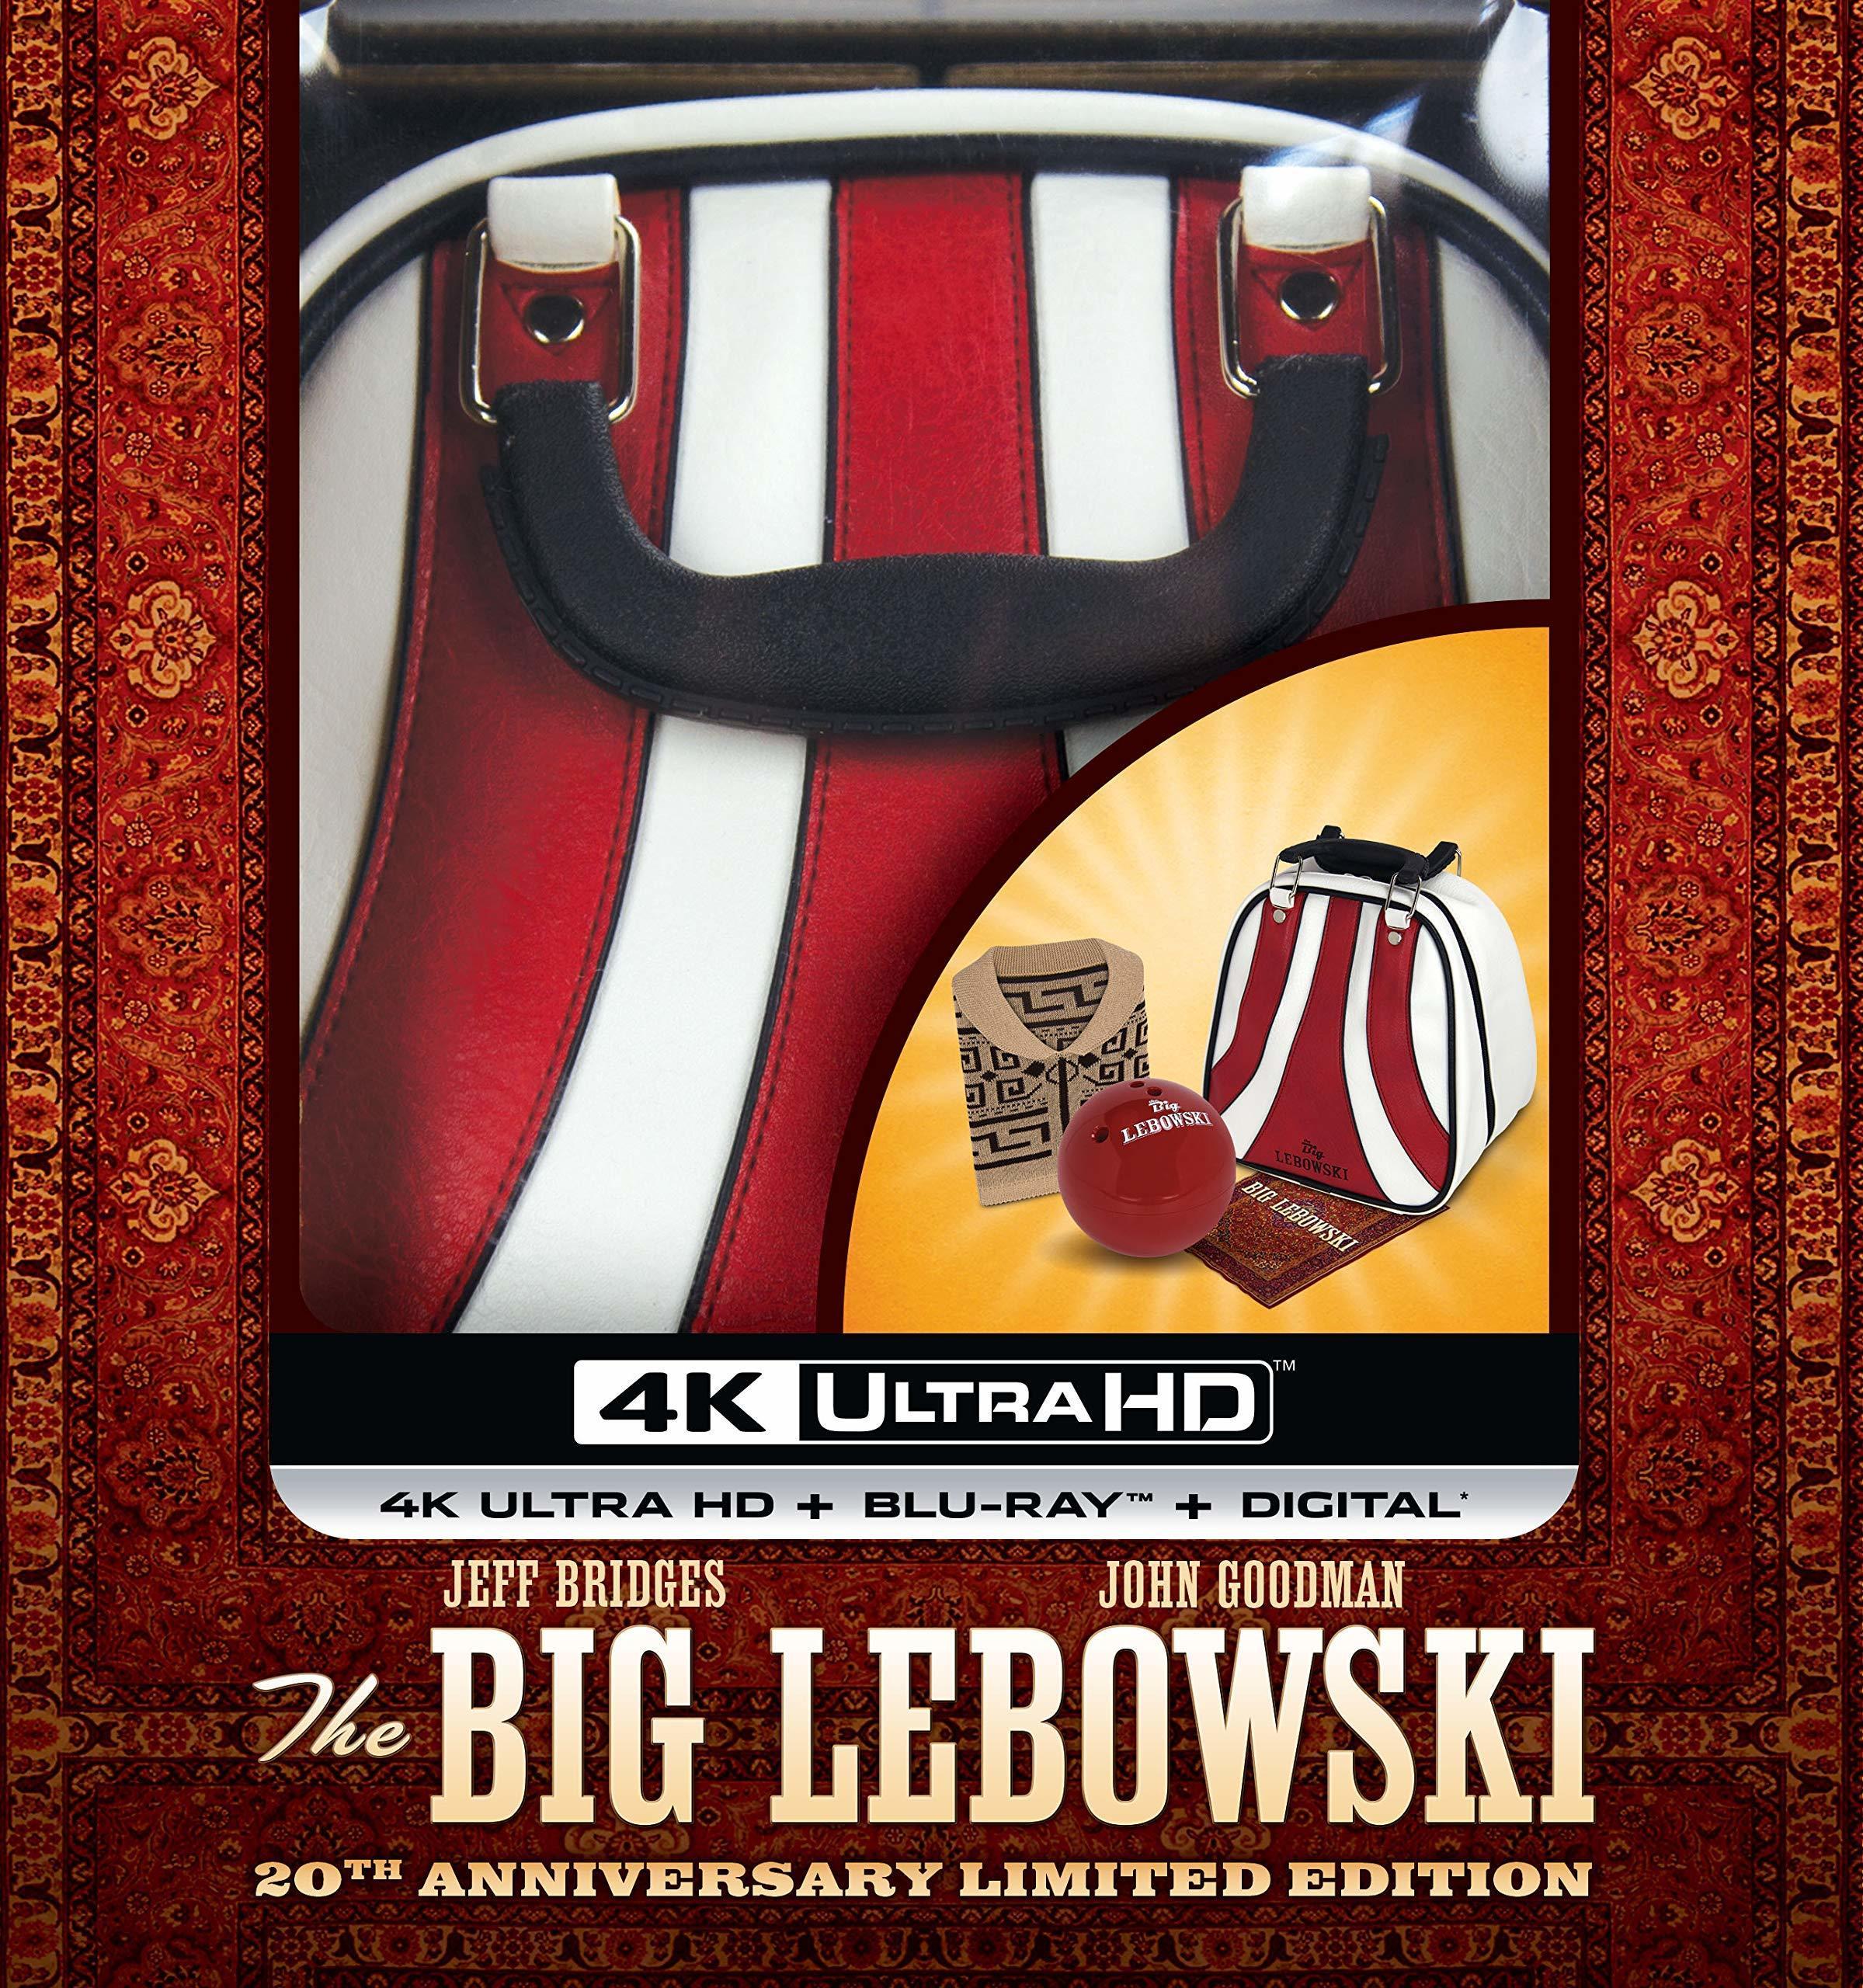 The Big Lebowski 4K (20th Anniversary Limited Bowling Ball Edition)(1998) 4K Ultra HD Blu-ray